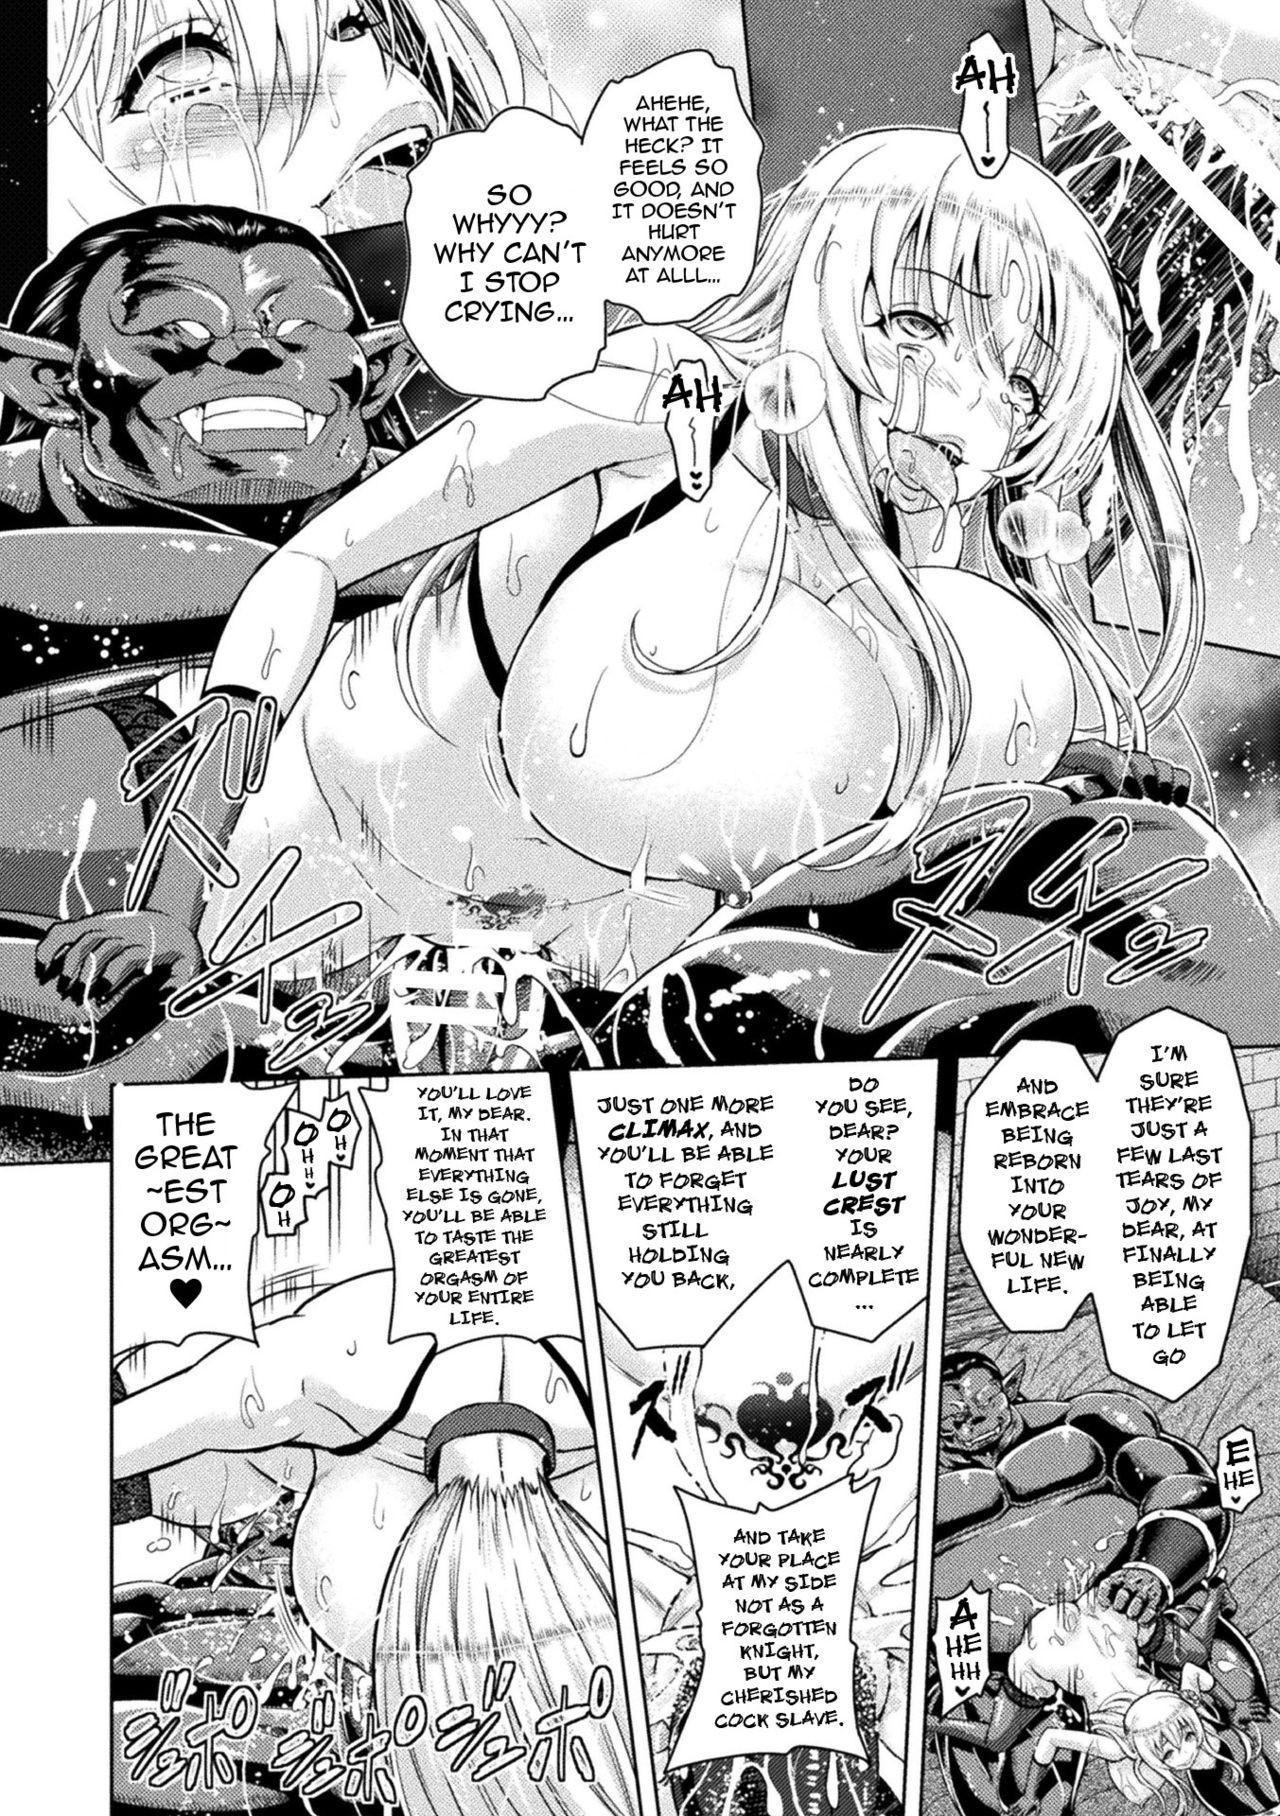 [Yamada Gogogo] Erona ~Orc no Inmon ni Okasareta Onna Kishi no Matsuro~ | Erona ~The Fall of a Beautiful Knight Cursed with the Lewd Mark of an Orc~ Ch. 1-5 [English] {darknight} 70